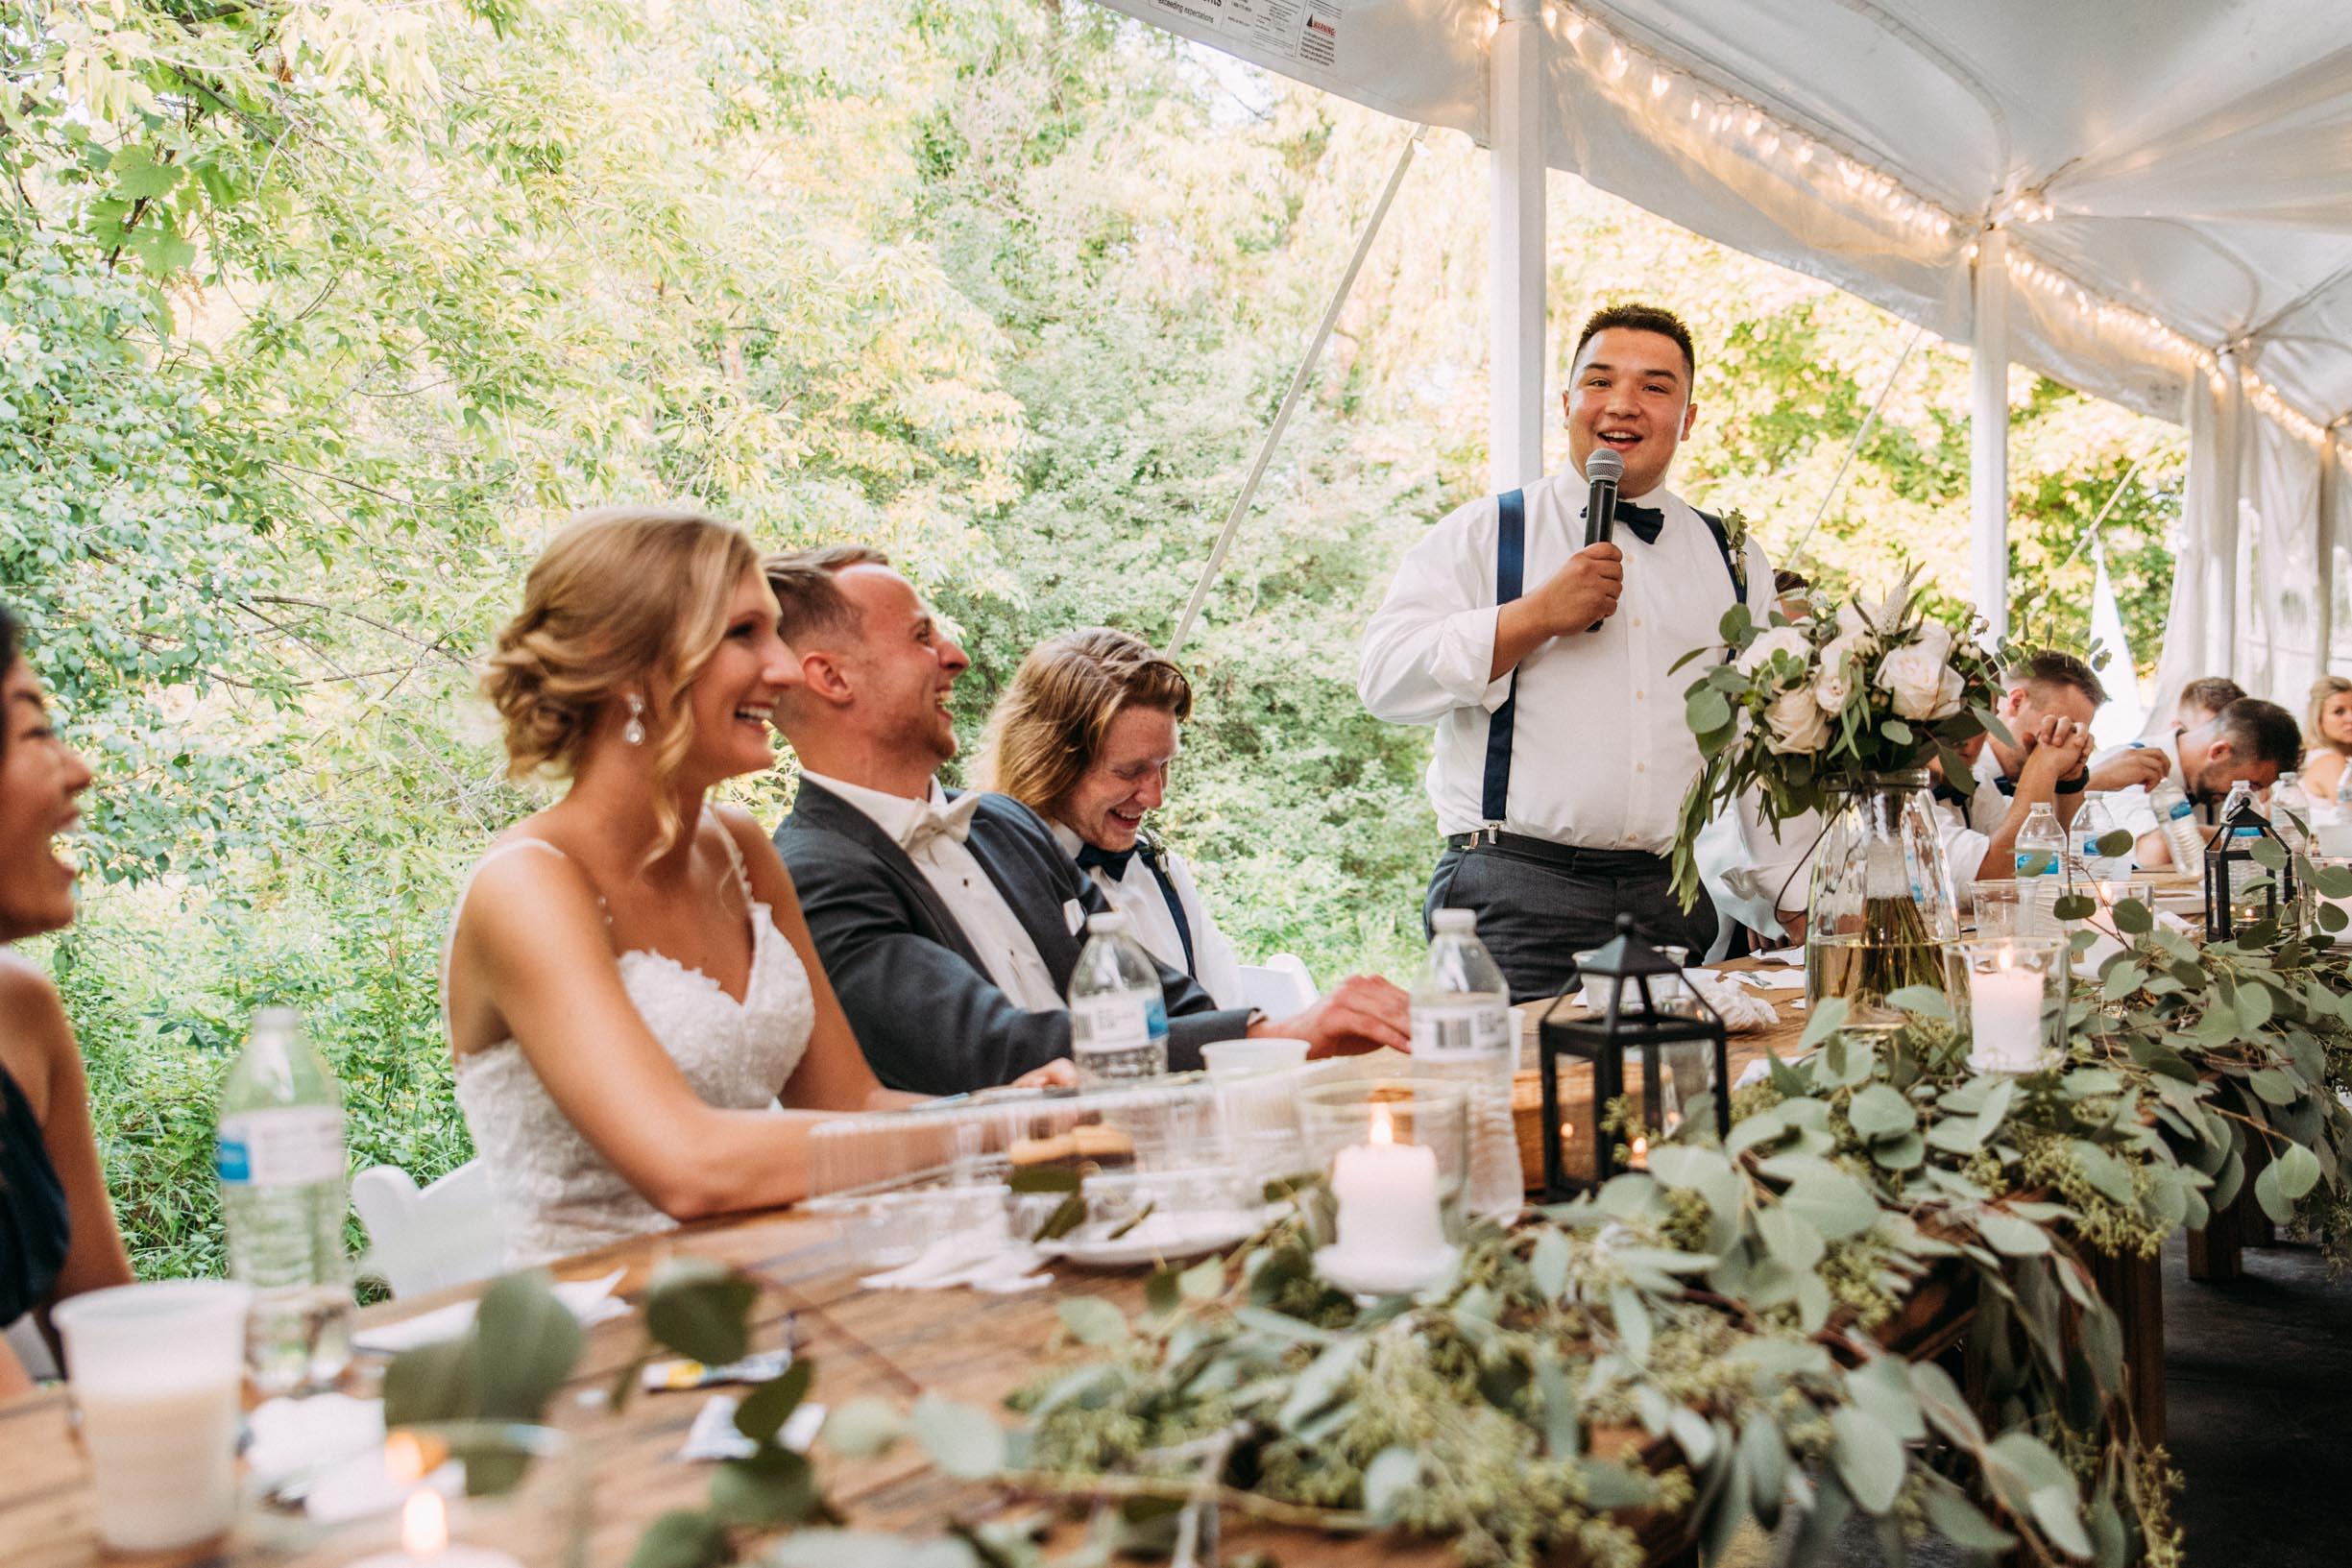 31-Minnetonka Orchards Wedding Ashley Bryce Blog.jpg